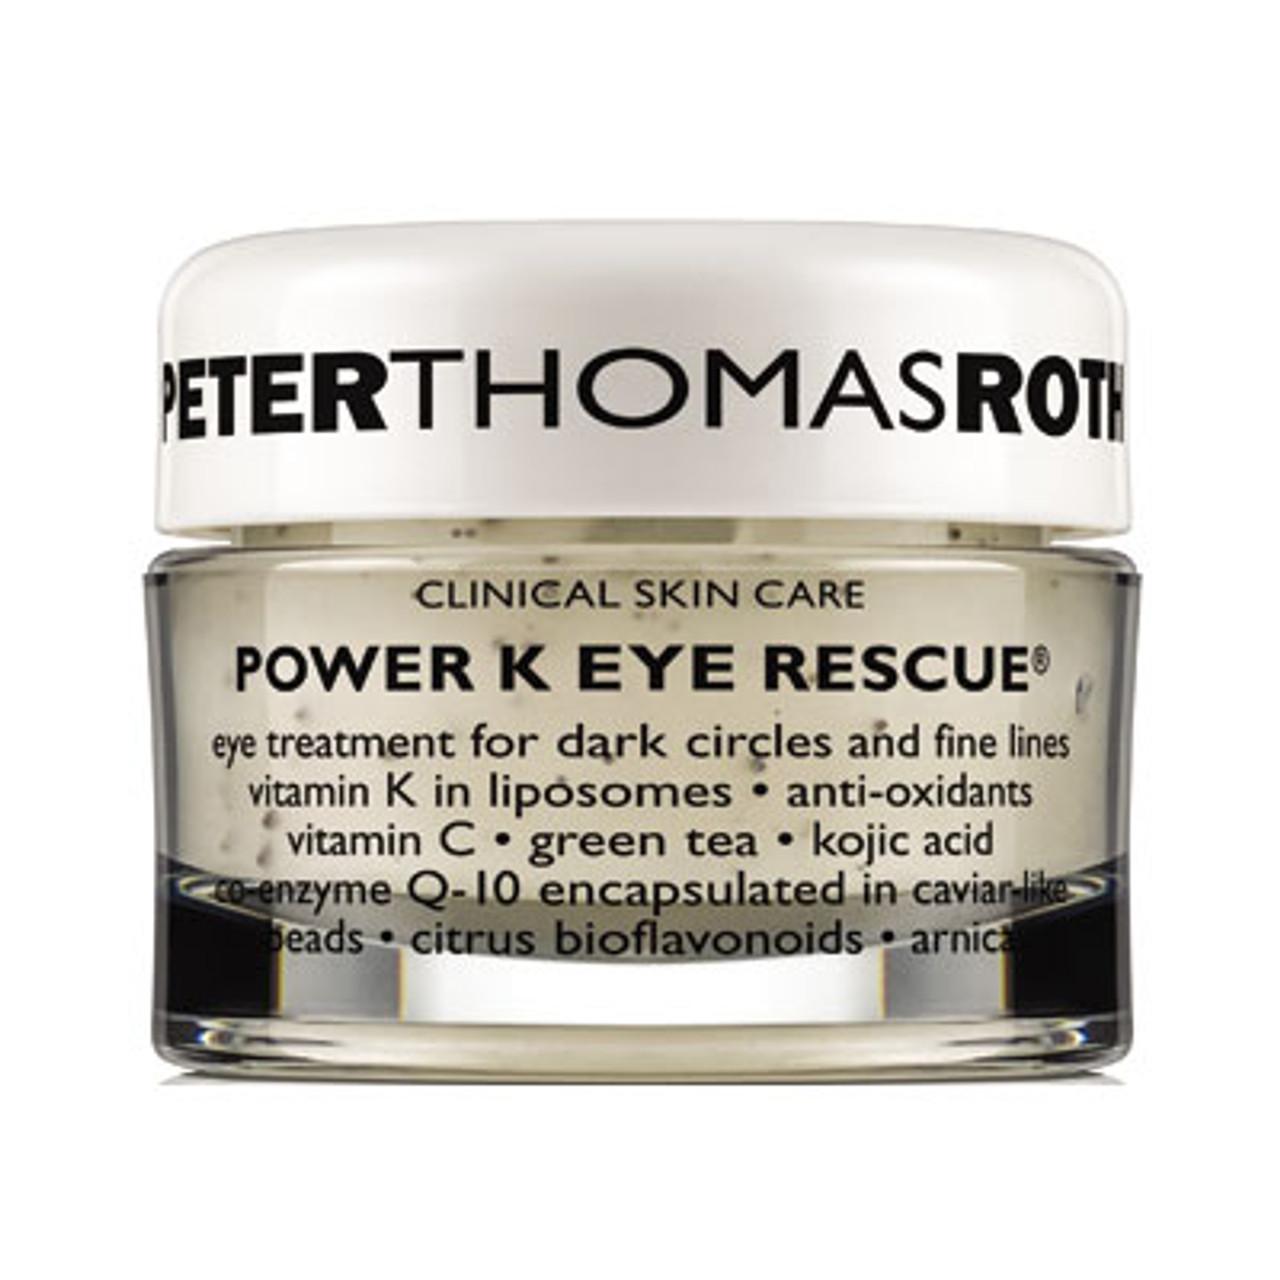 Peter Thomas Roth Power K Eye Rescue (discontinued) BeautifiedYou.com